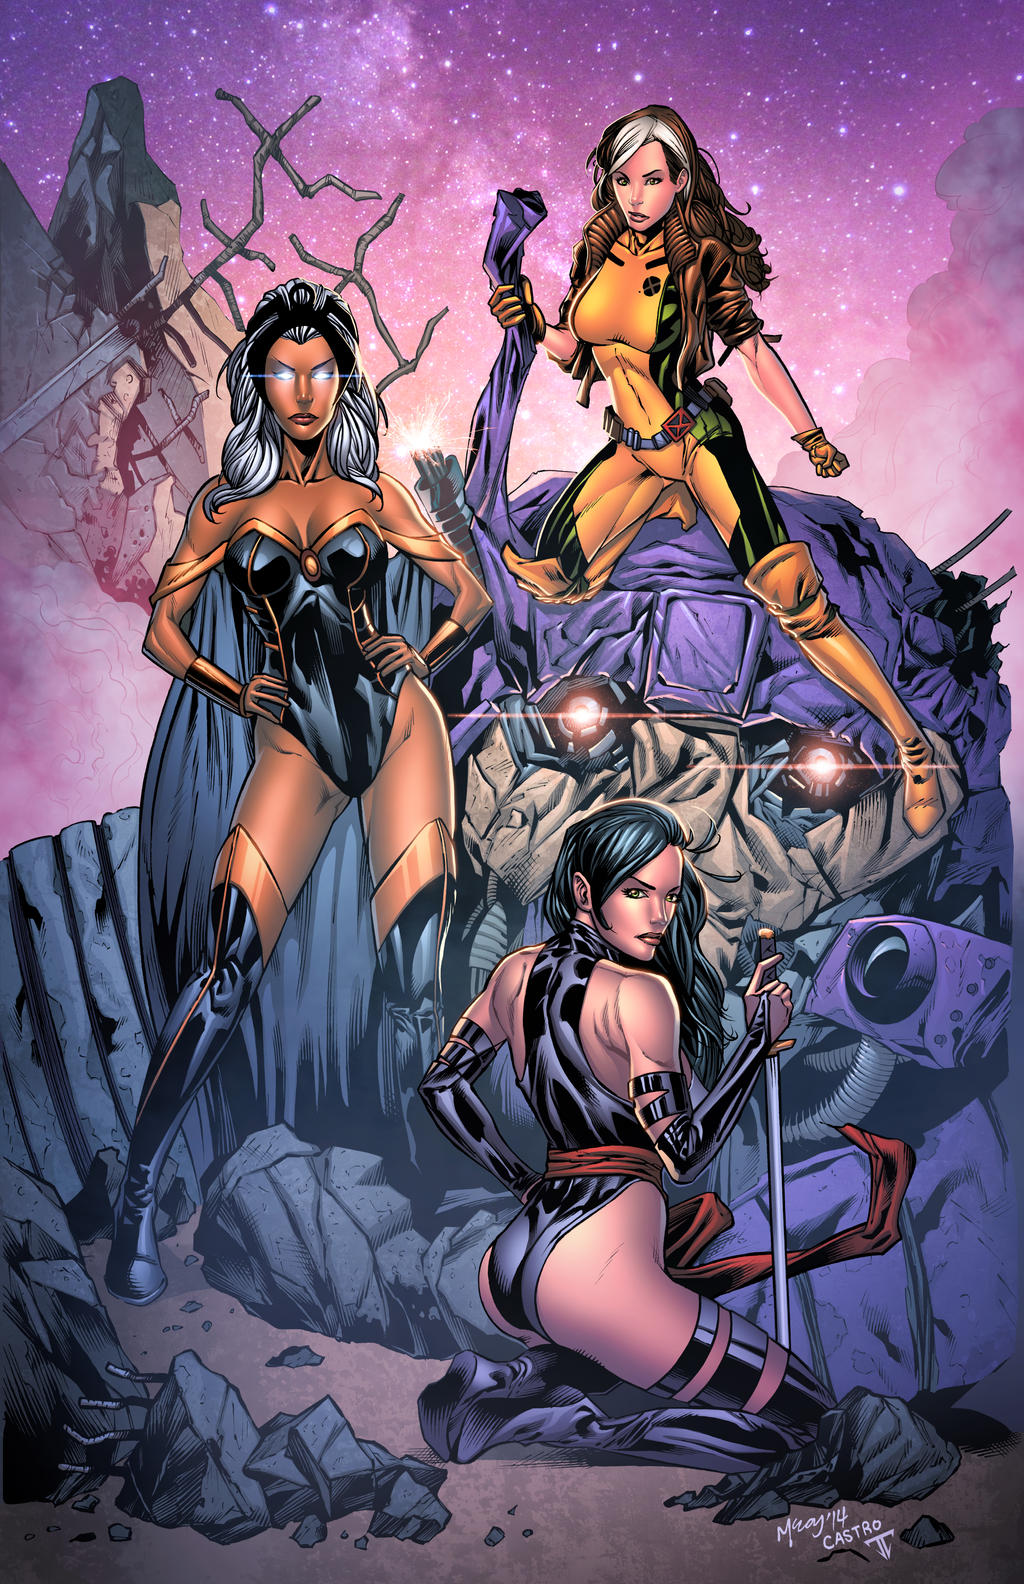 X Girls By Juan7fernandez On Deviantart